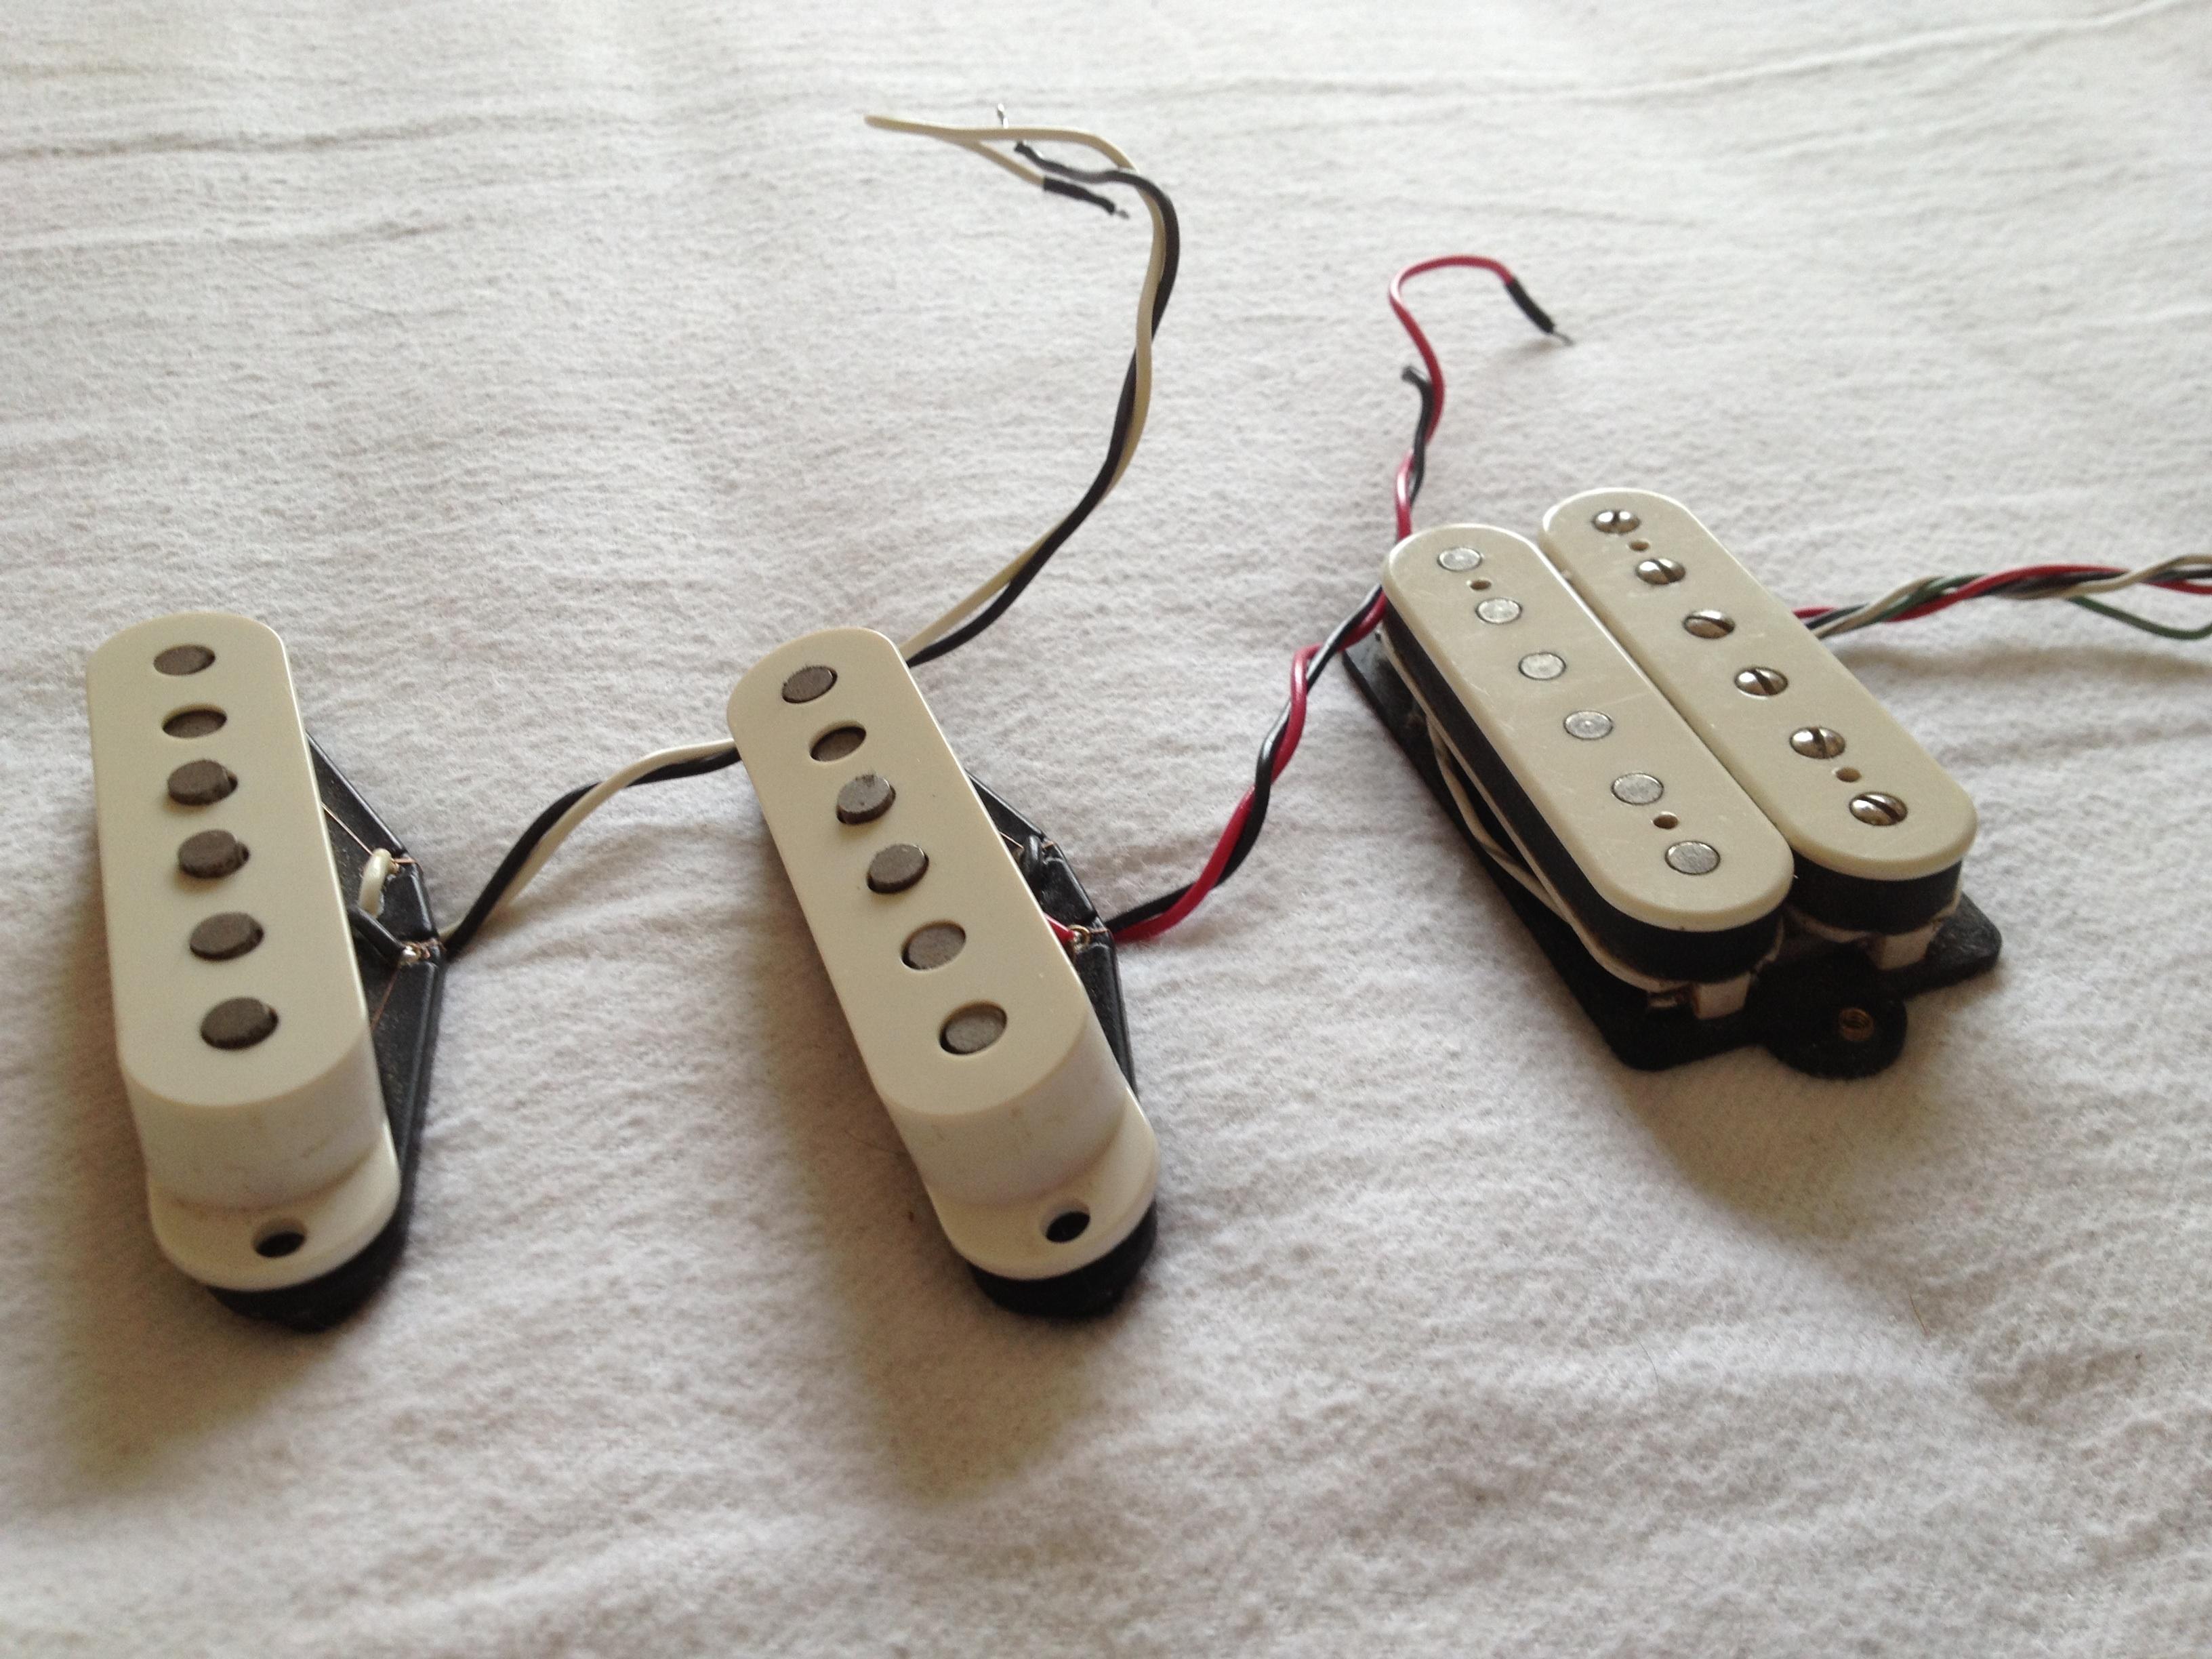 Fender Tex-mex Strat Pickups Image   709246